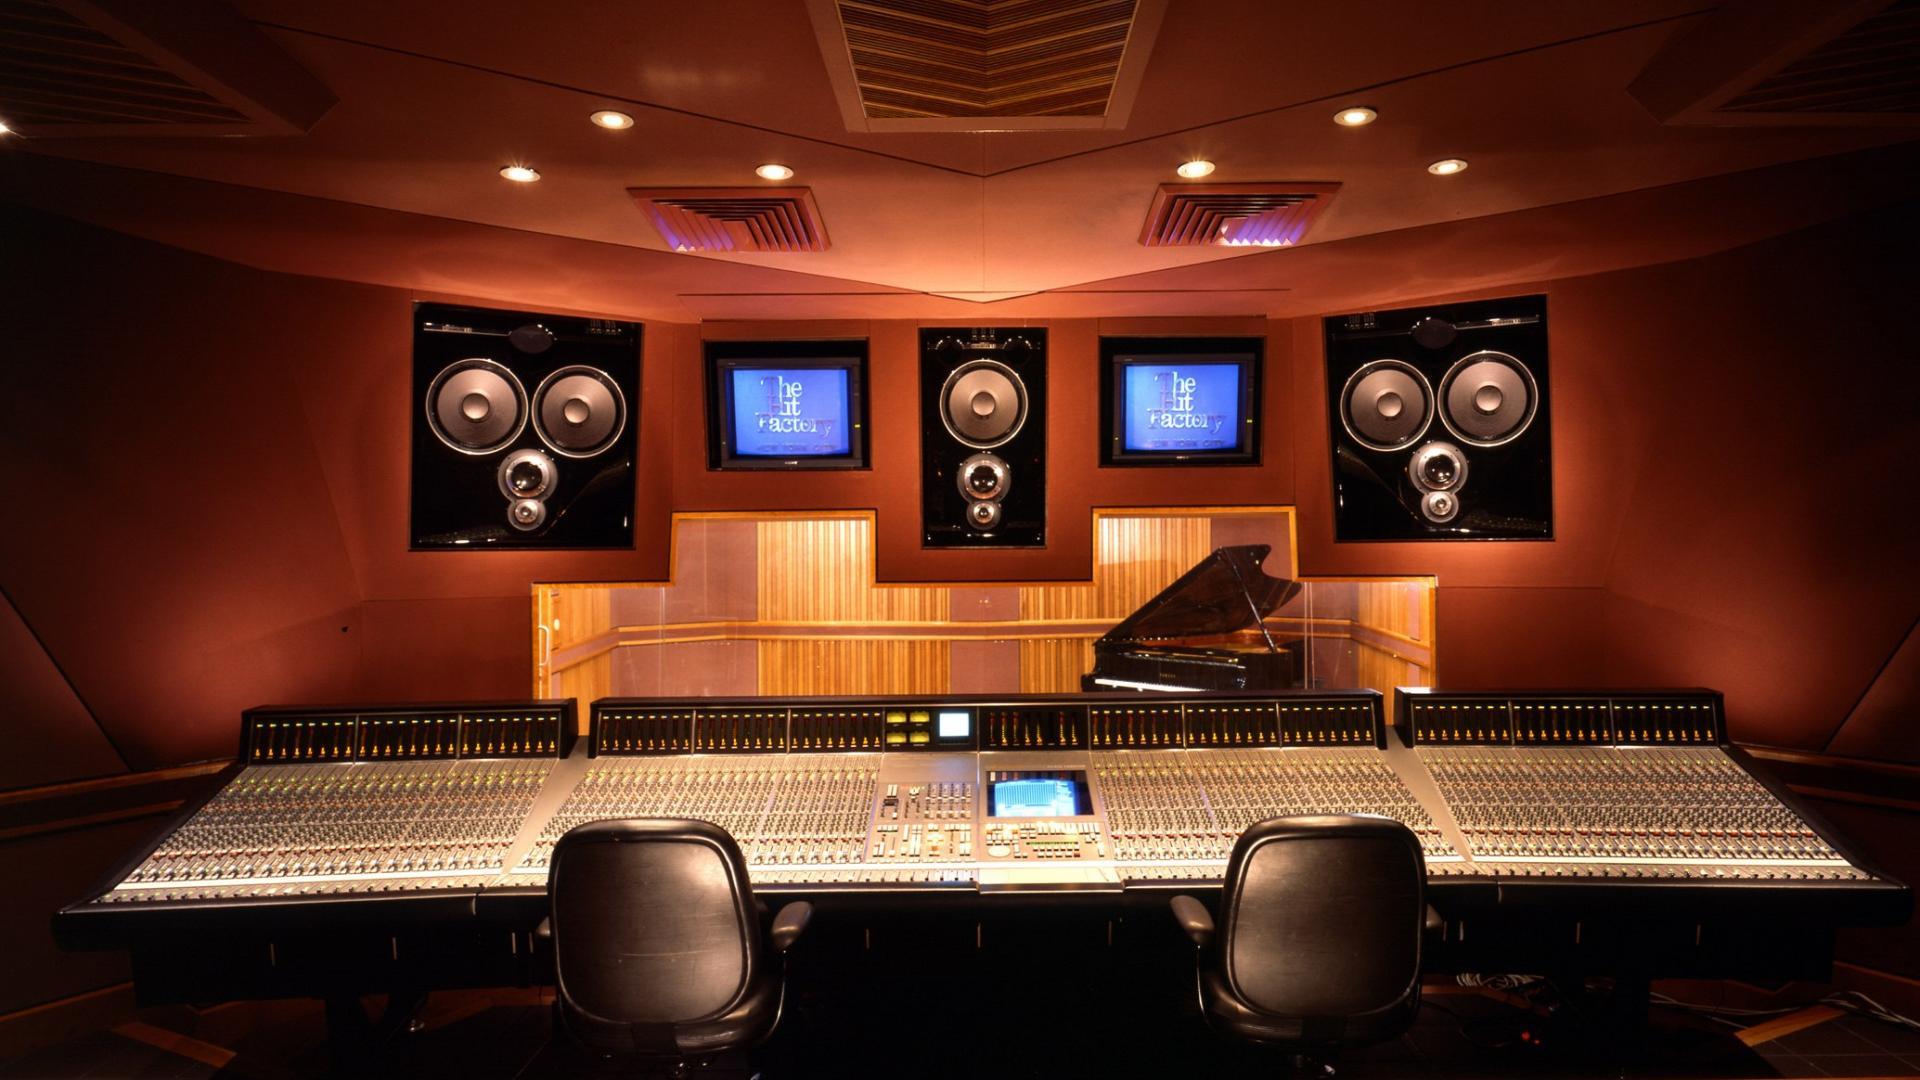 cool recording studio wallpapers wallpapersafari. Black Bedroom Furniture Sets. Home Design Ideas